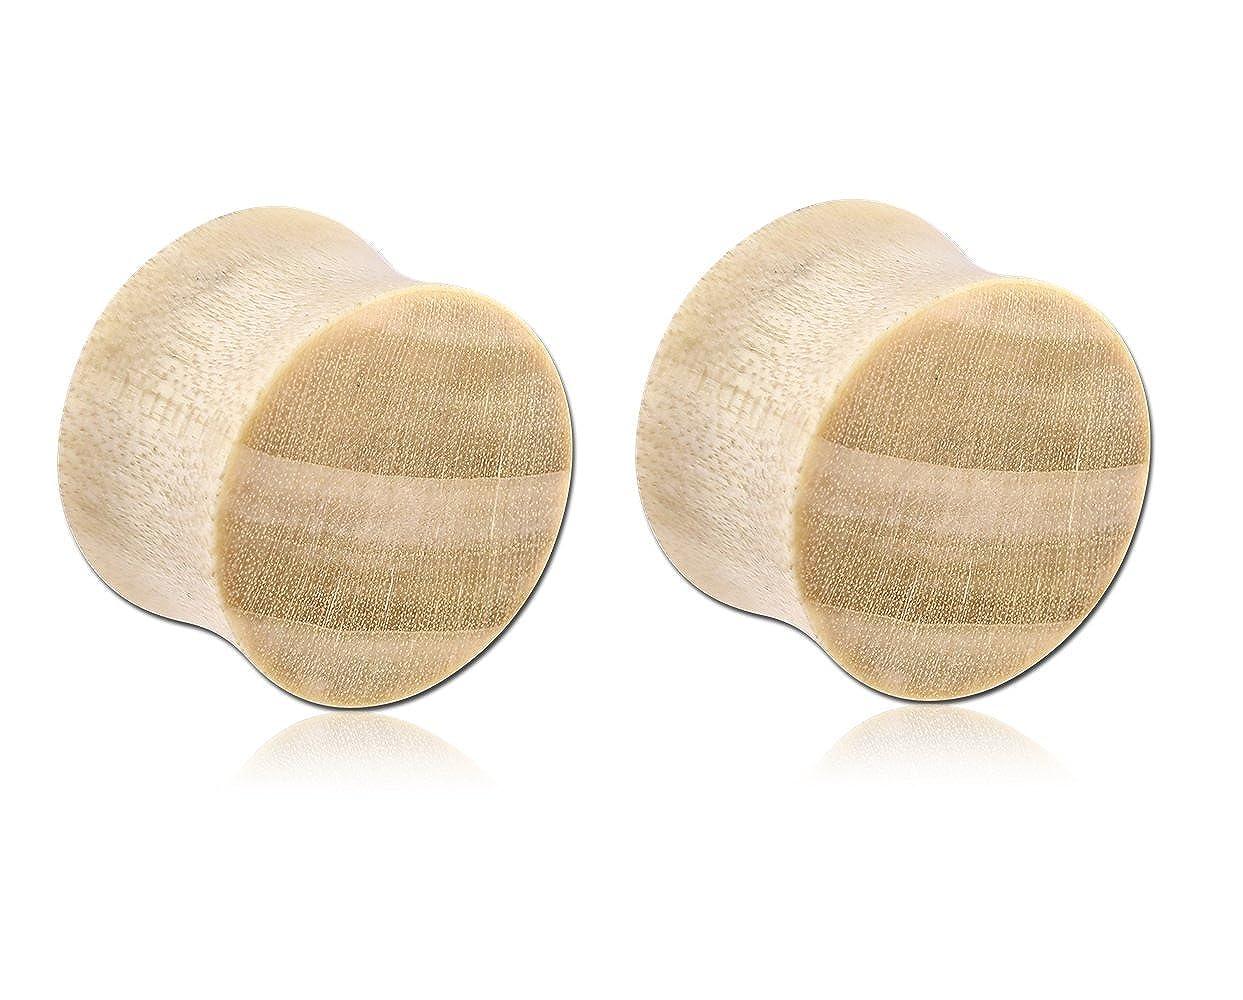 Holy Plug Body Piercing Jewelry Pair of 2 Crocodile Wood Double Flared Plug 000g 0000g 9//16 5//8 11//16 12g 13//16 11g 6g 4g 2g 0g